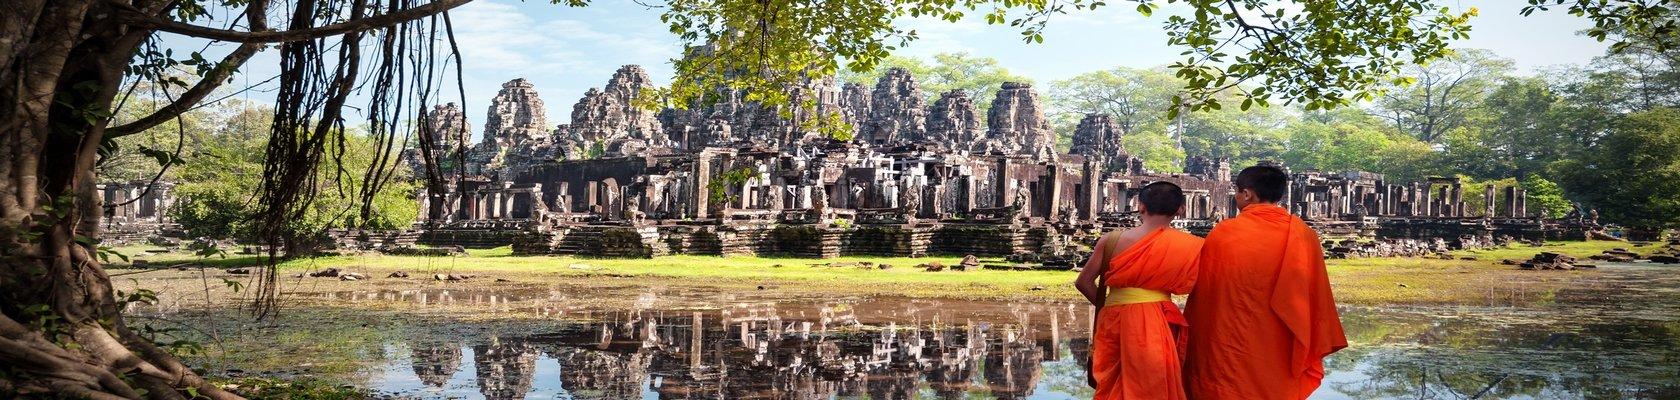 Tempelcomplex Angkor Wat